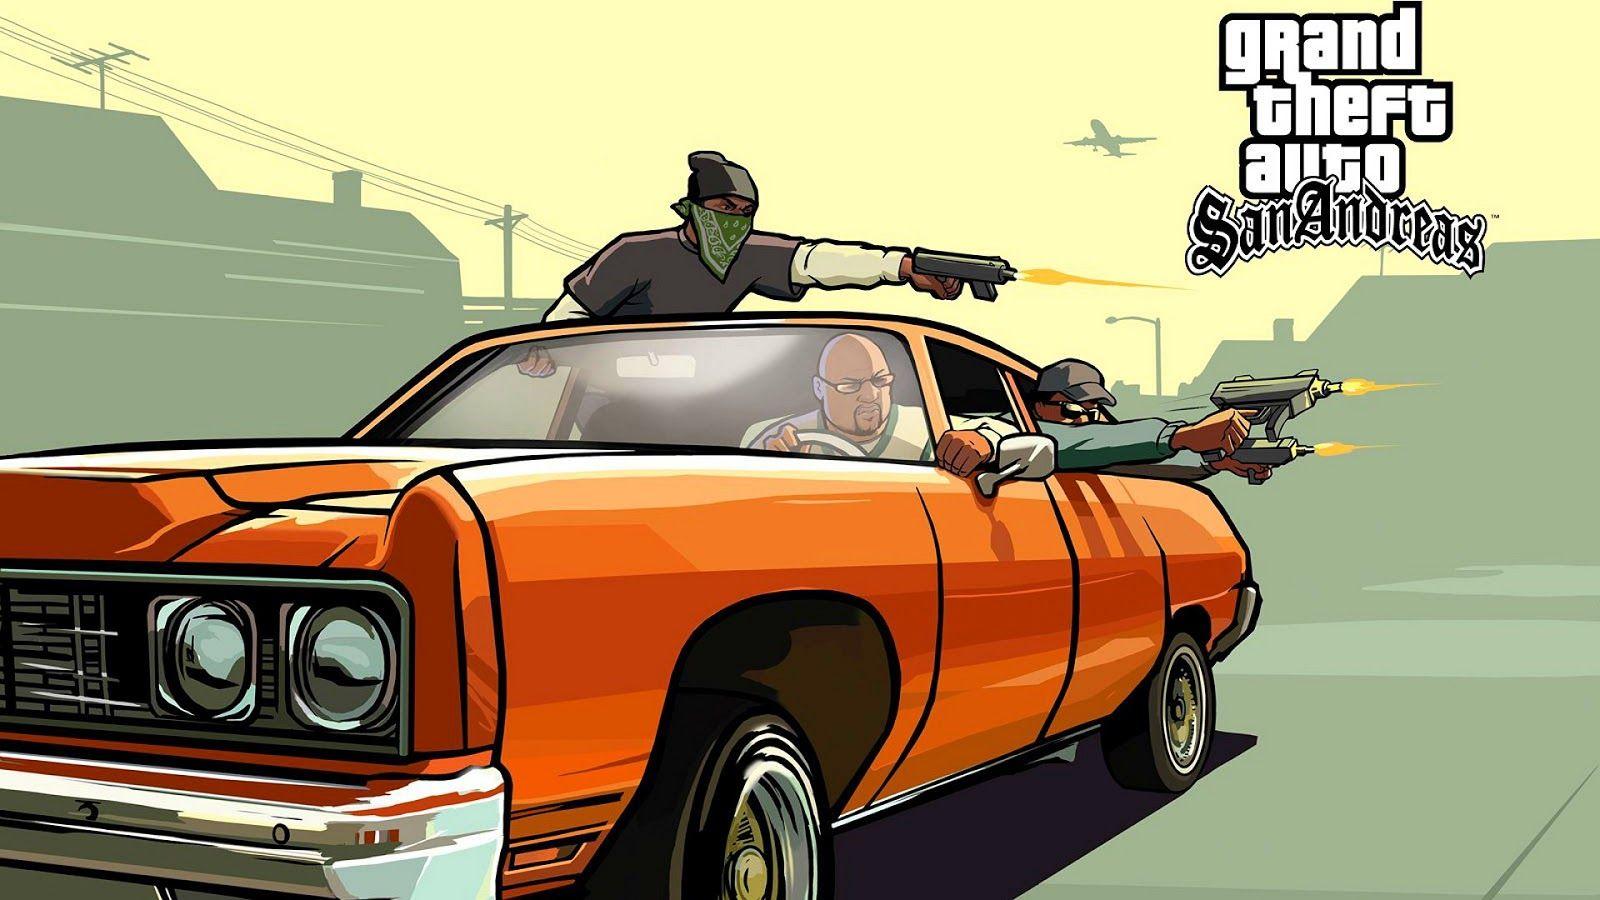 GTA SA Game 144 mb Download Highly Compressed File - Apk +